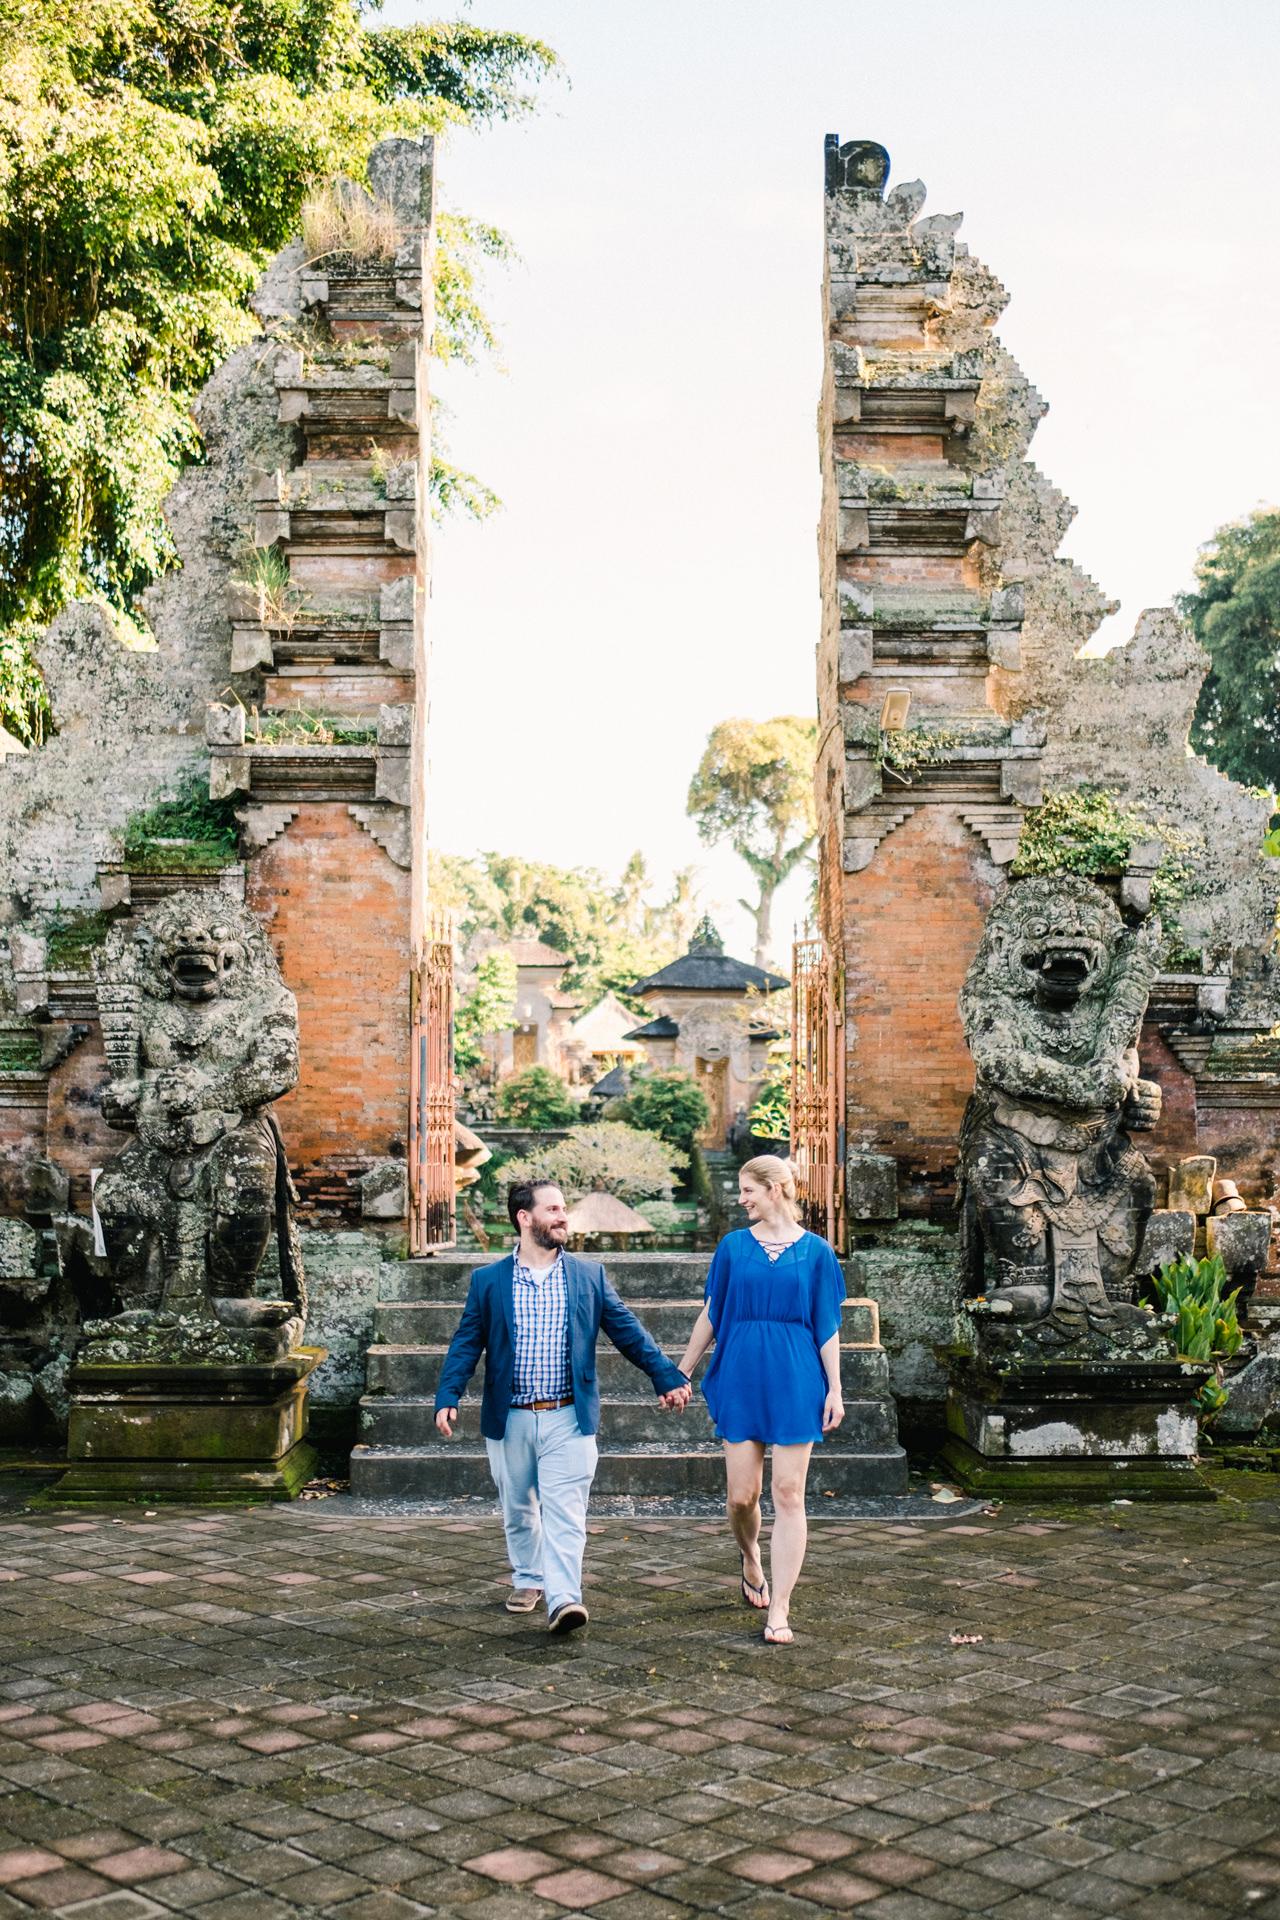 B&M: Surprise Proposal on Bali Vacation 12